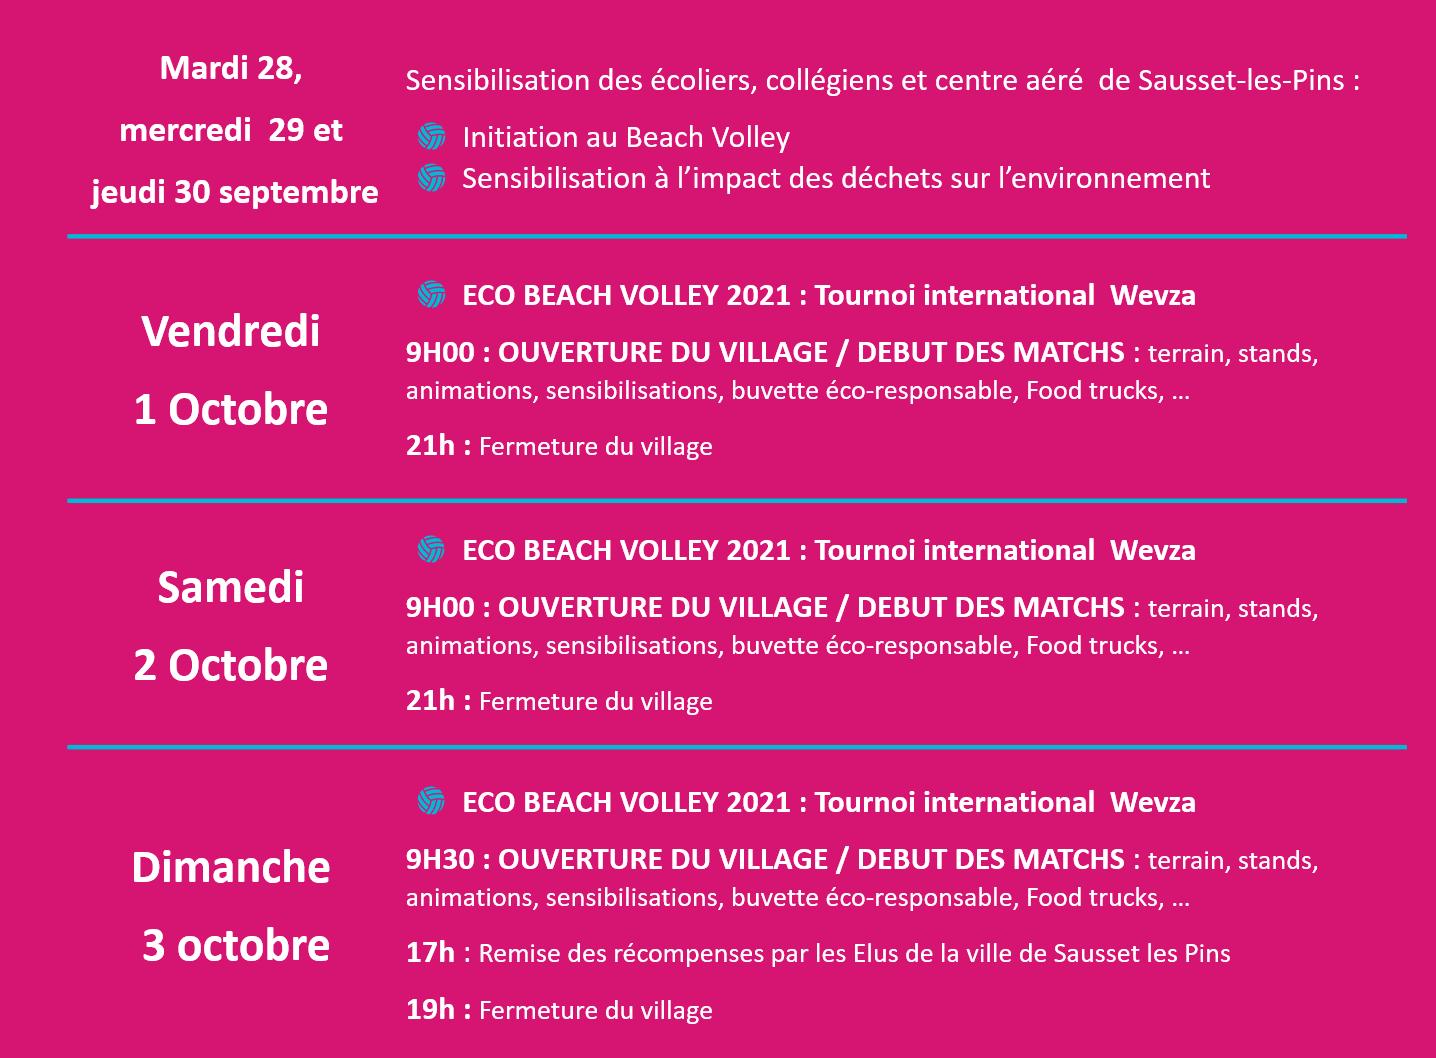 Agenda Eco Beach Volley